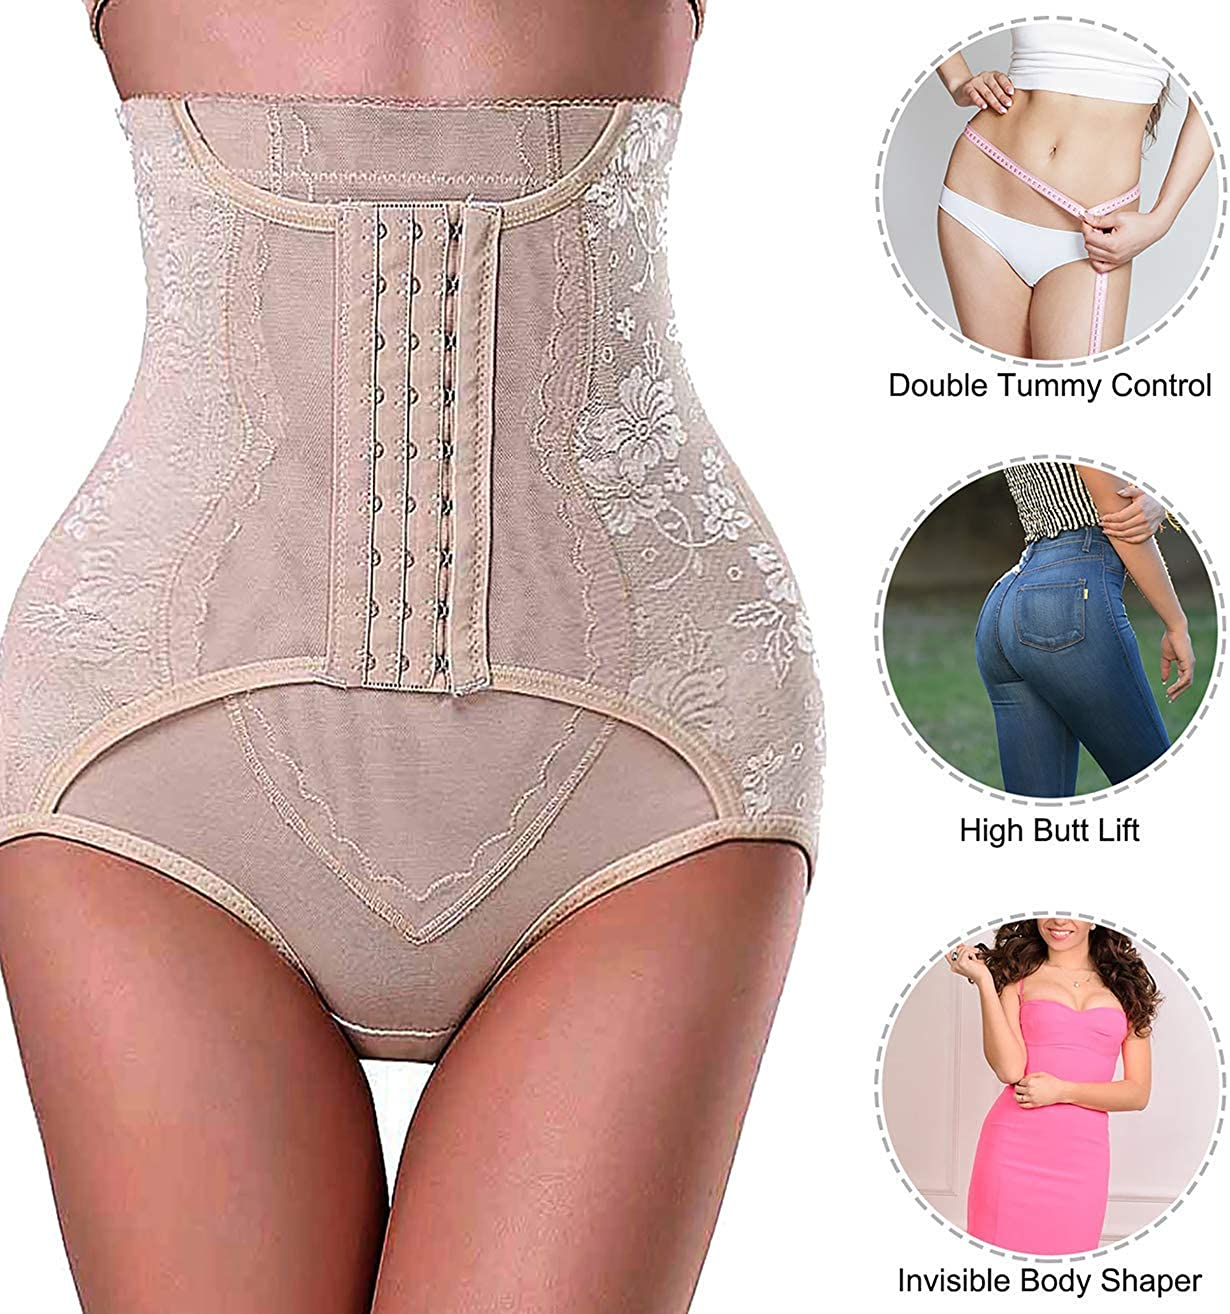 Lilith Thigh Slimmers Women High Waist Bodyshaper Slim Pants Body Shaper for Tummy Control